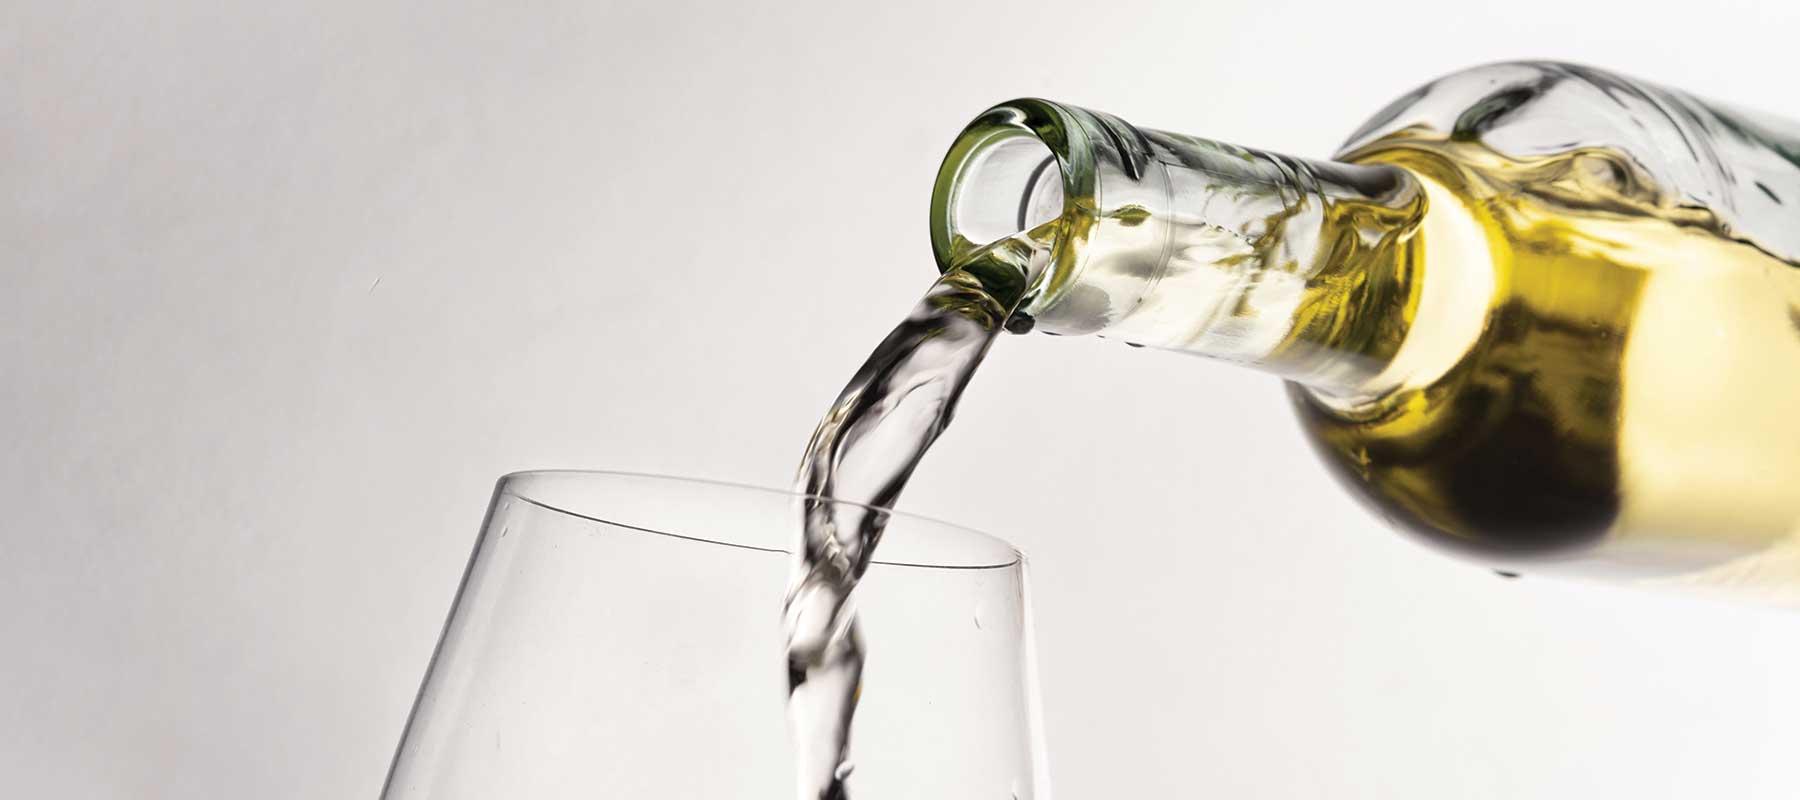 bottiglia con vino